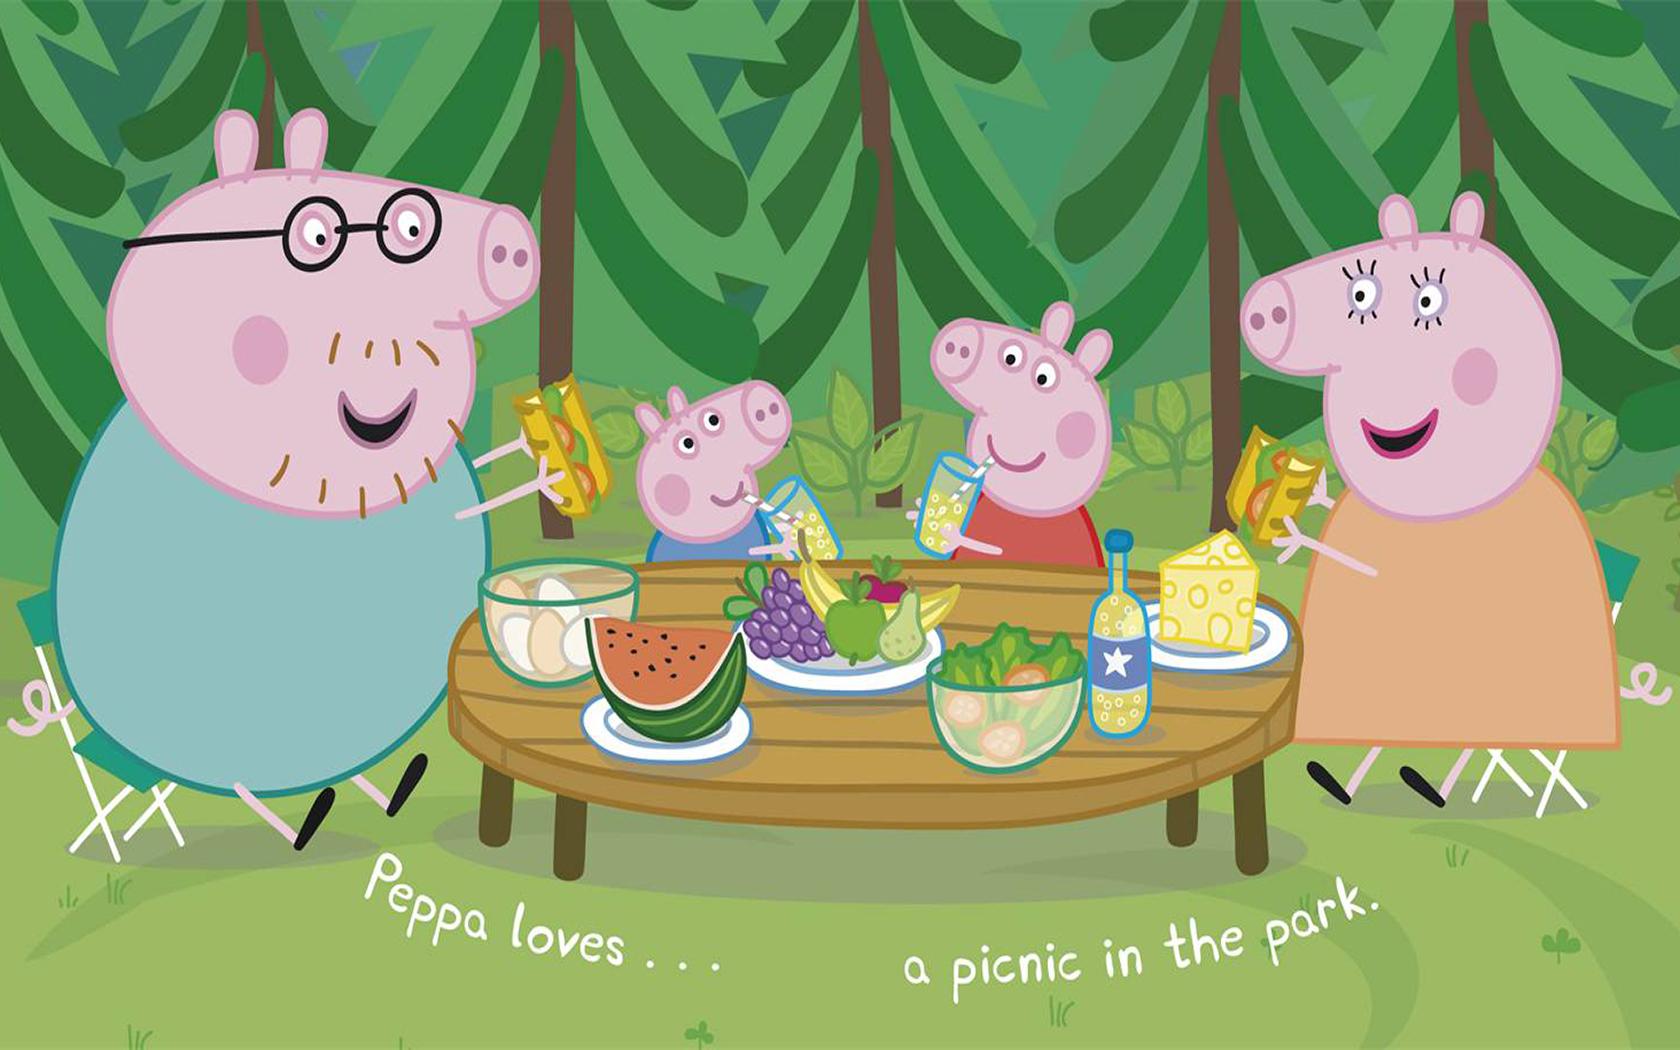 peppa pig Computer Wallpapers Desktop Backgrounds 1680x1050 ID 1680x1050